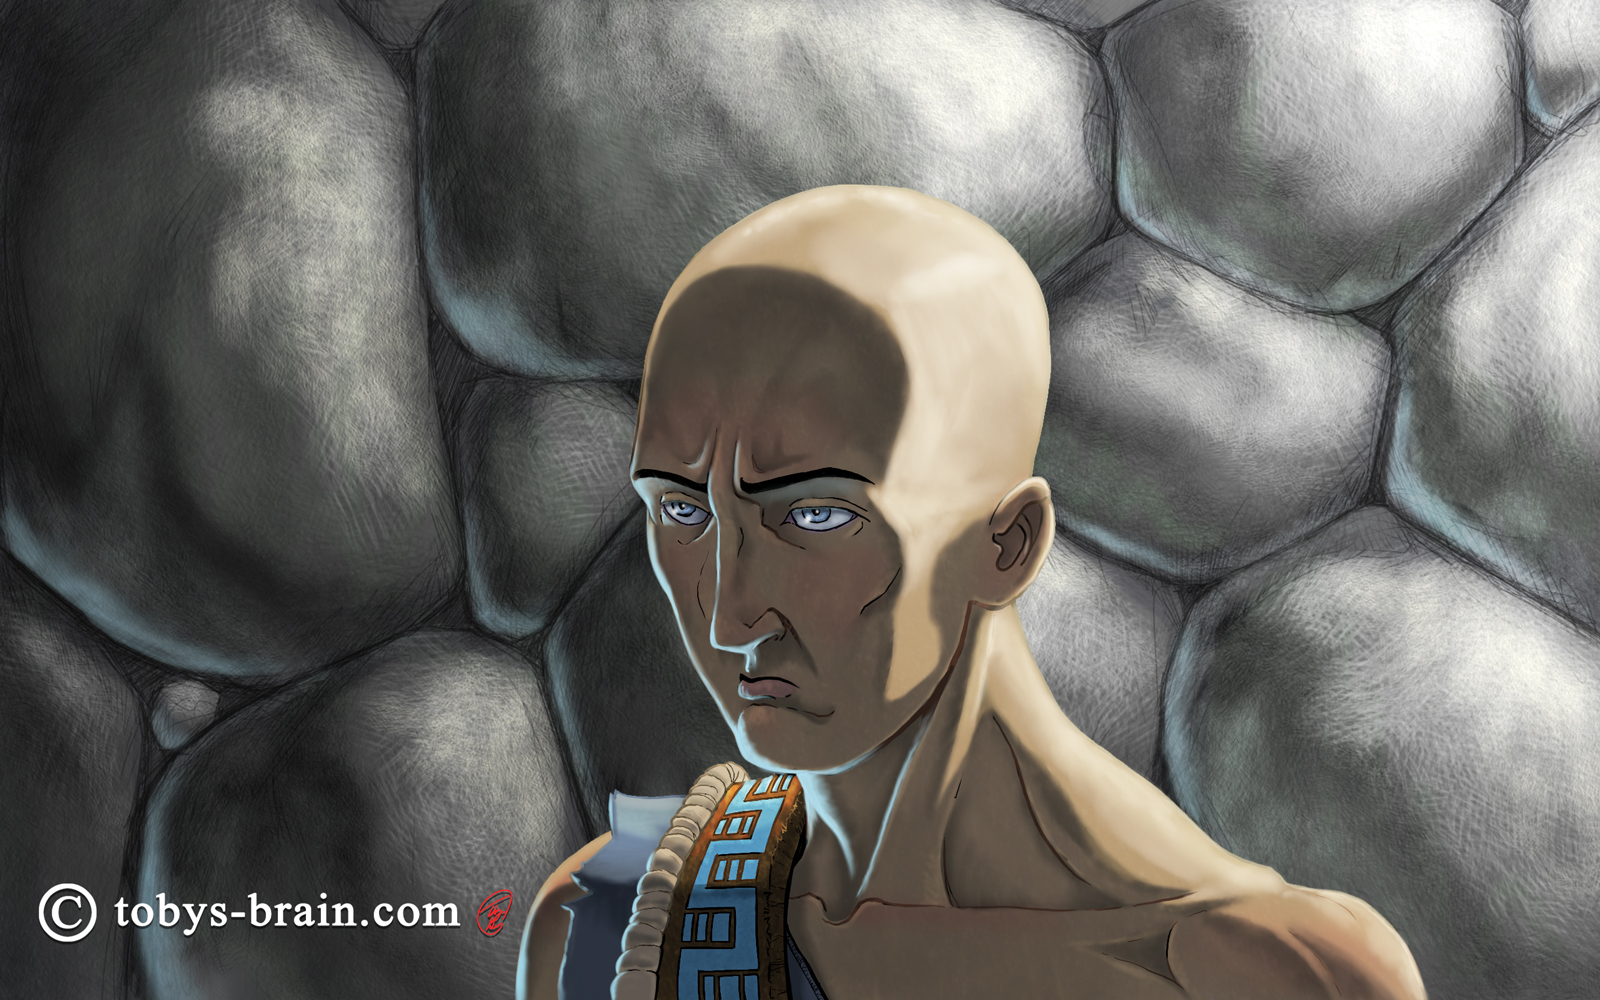 toby-gray-grumpy-monk